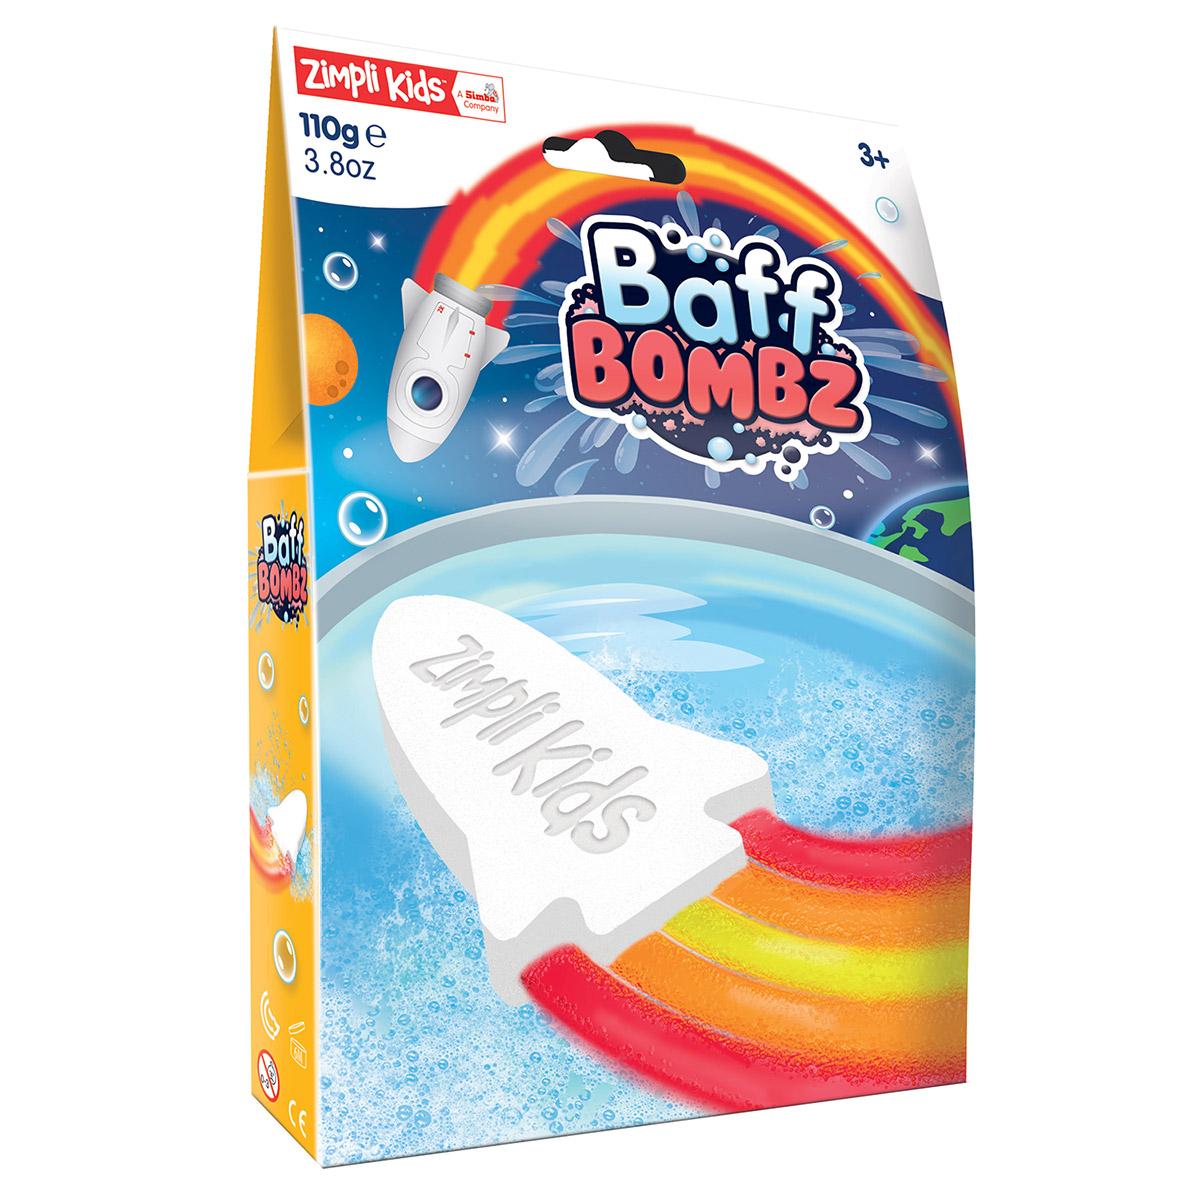 Zimpli Kids Rocket Baff Bombz